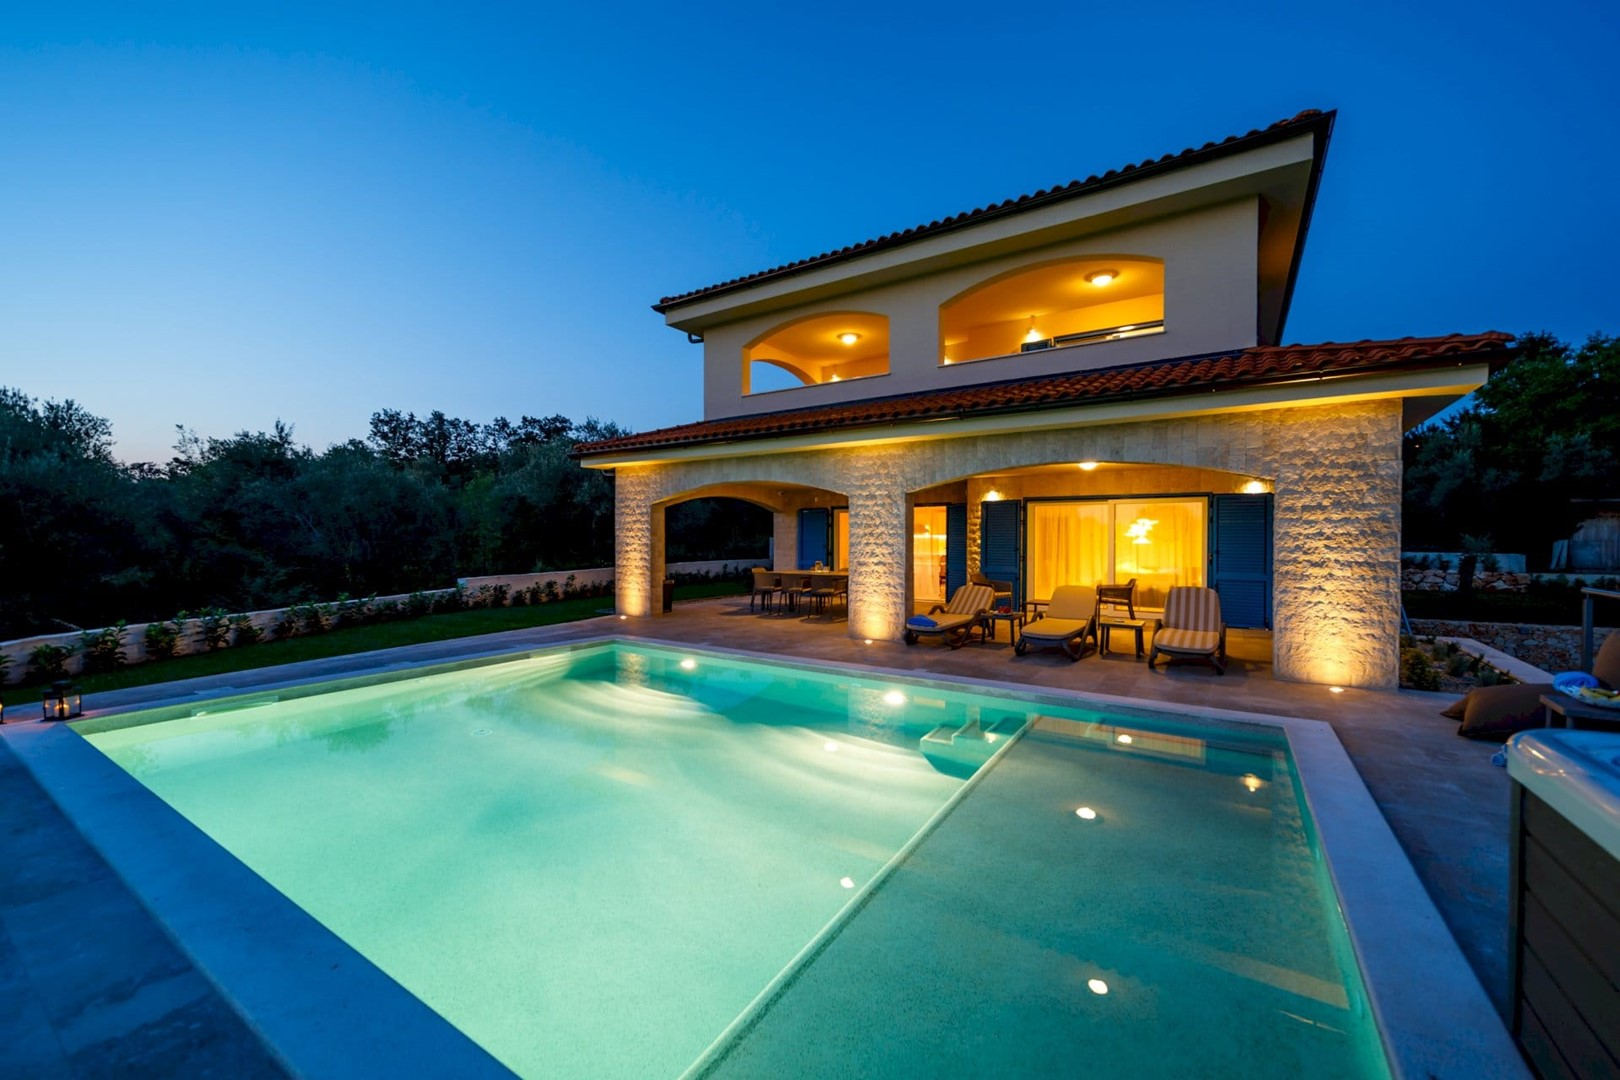 Ferienhaus Luxury Villa Loma 1 (2586644), Sveti Vid-Miholjice, Insel Krk, Kvarner, Kroatien, Bild 1